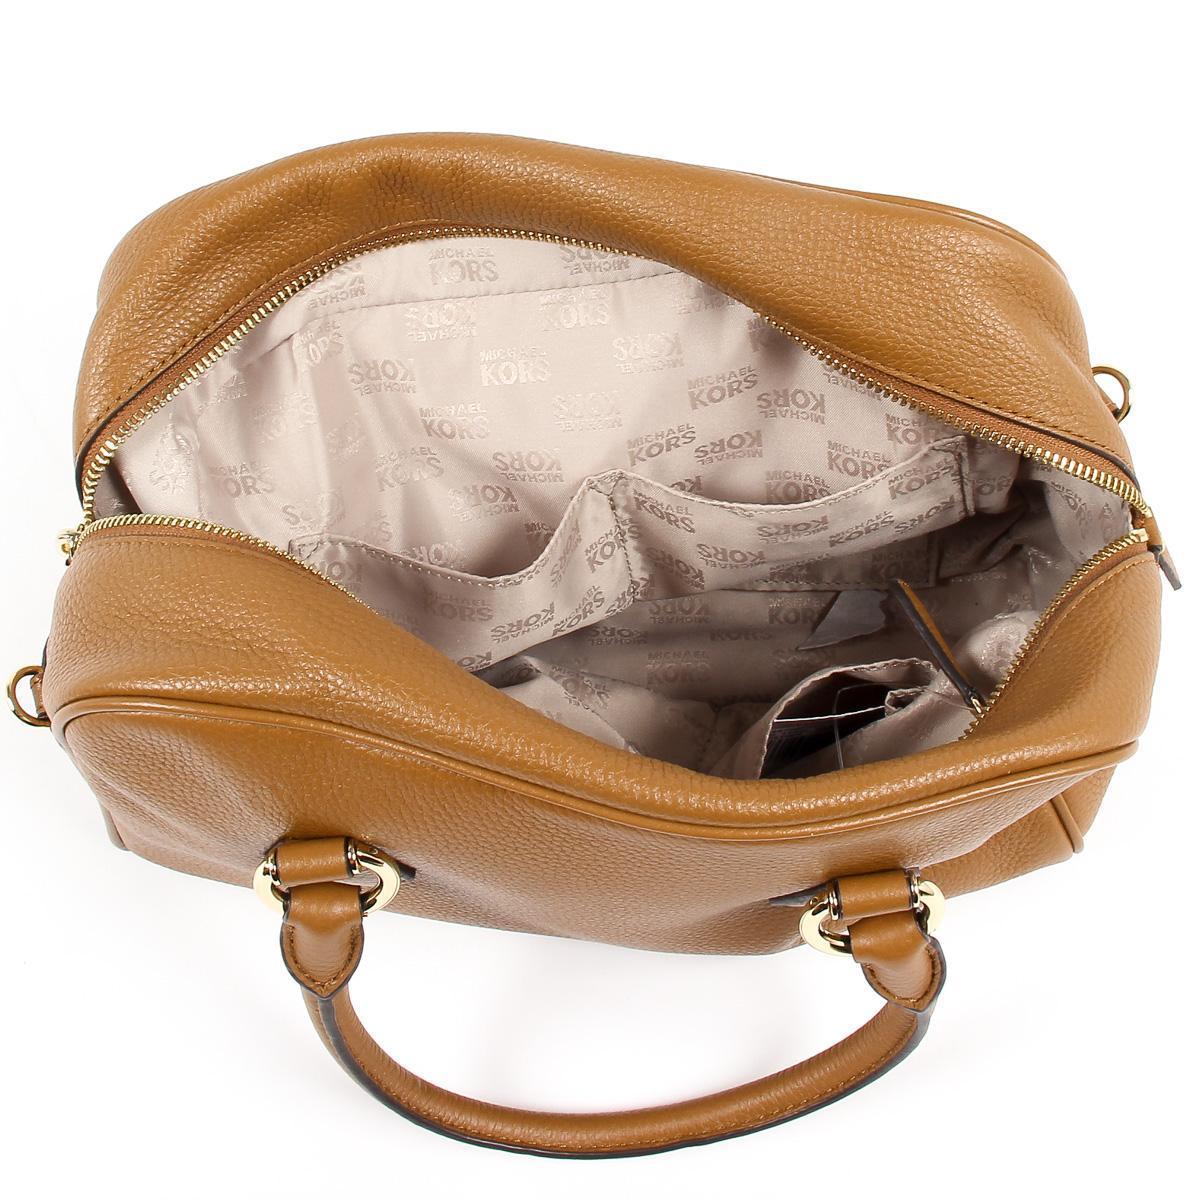 Michael Kors Womens Handbag BEDFORD 35S7GBFS2T ACORN